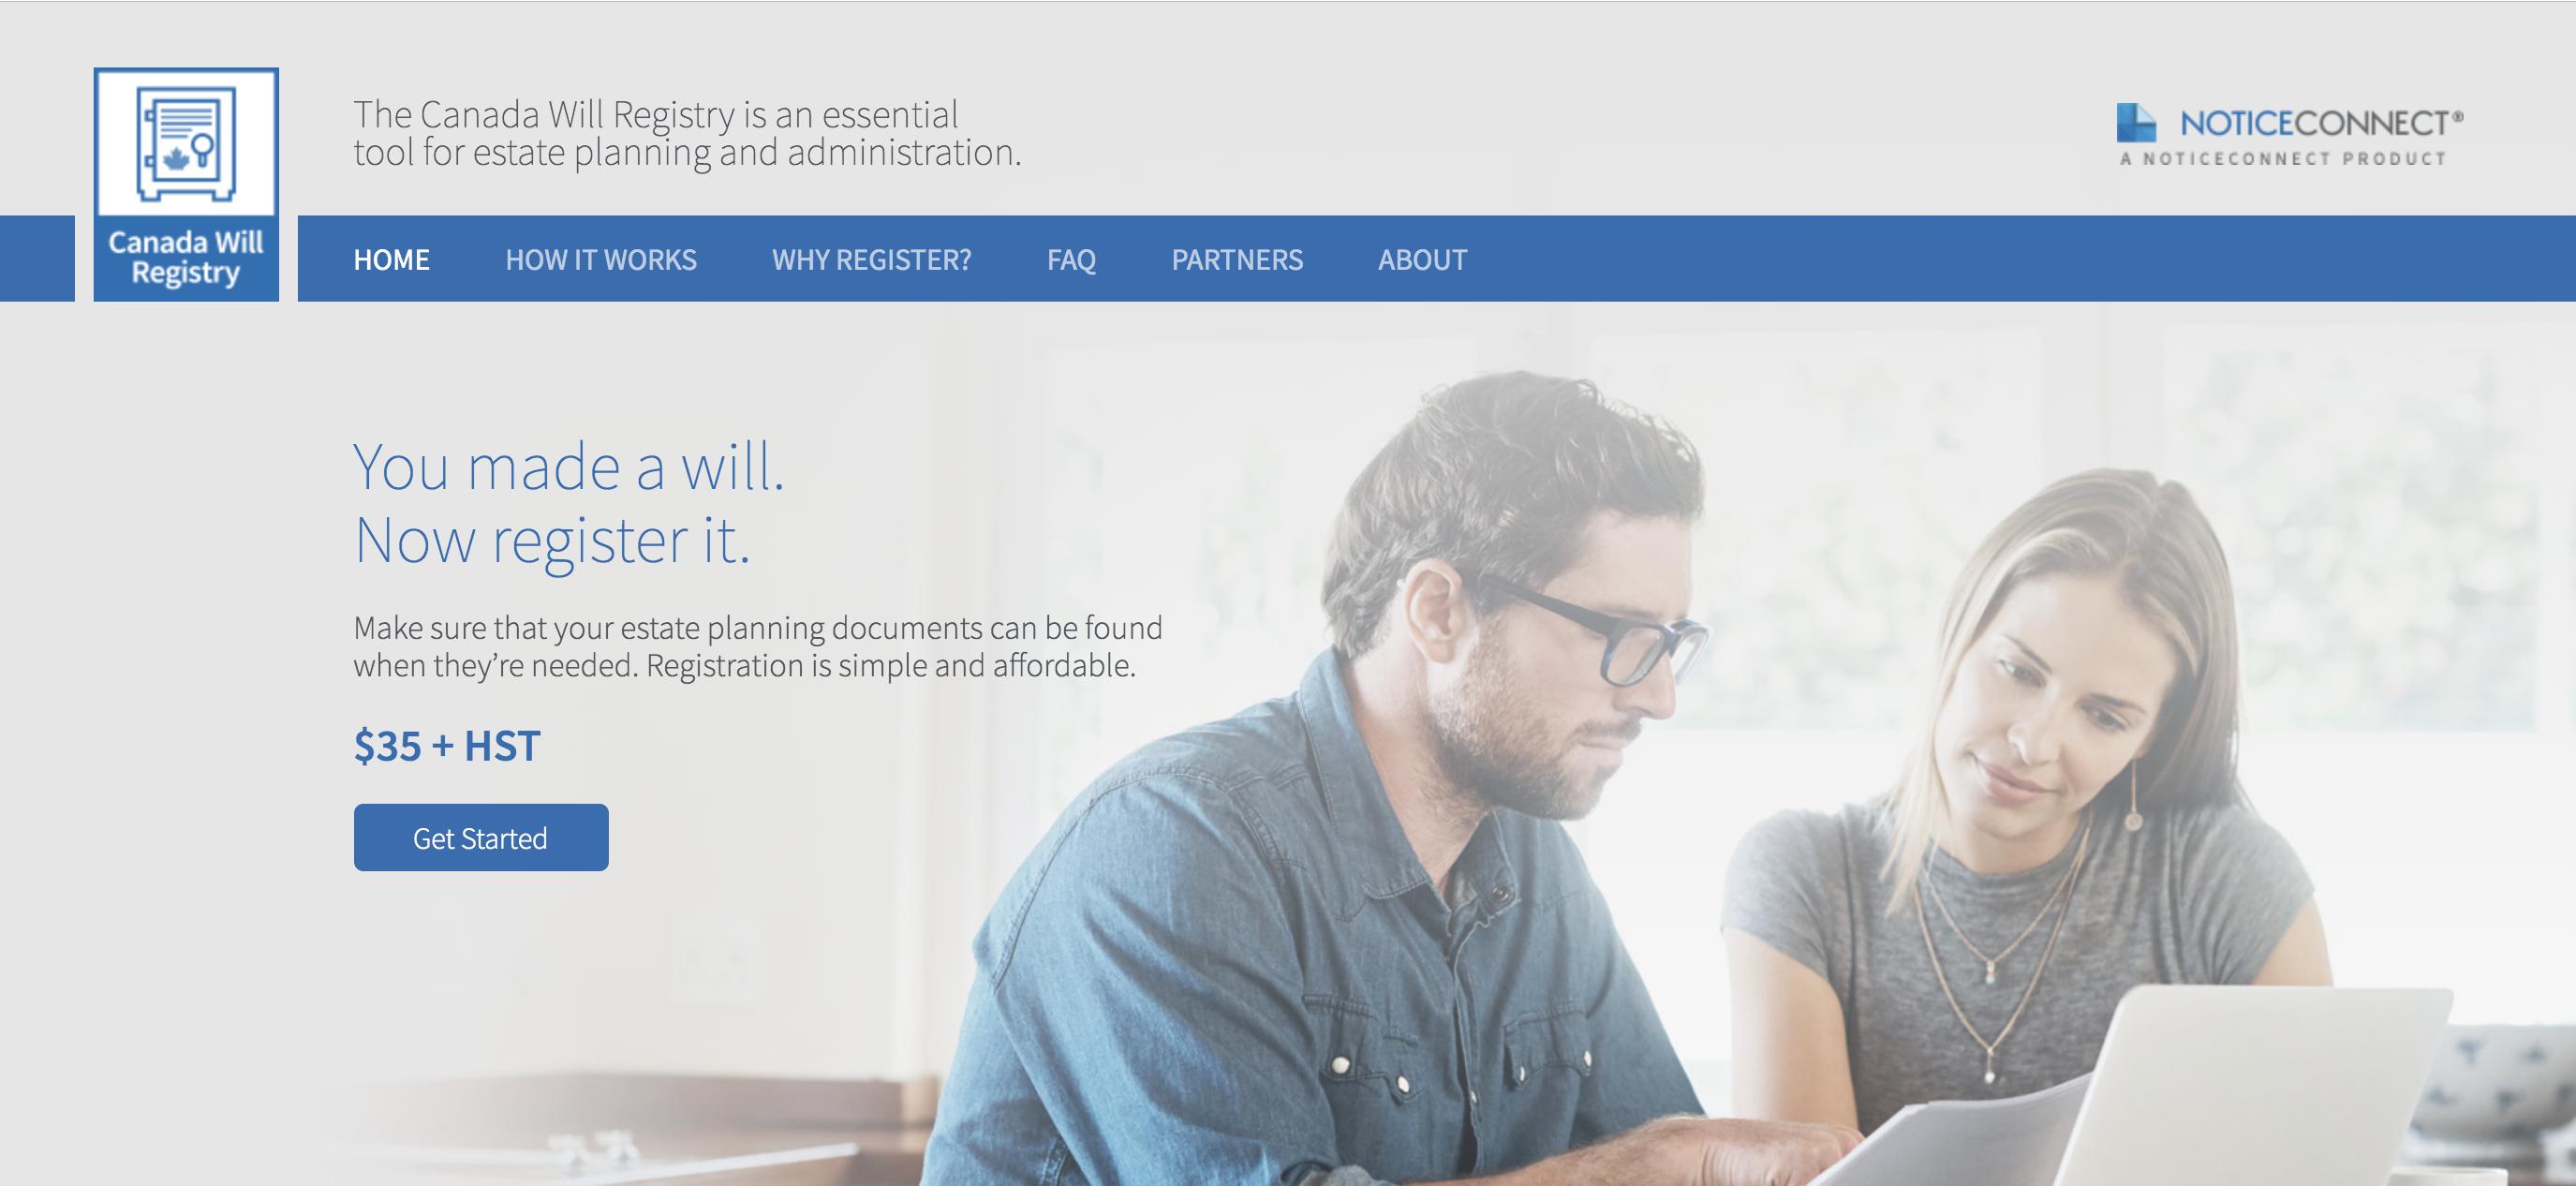 Canada Will Registry - Register Your Will